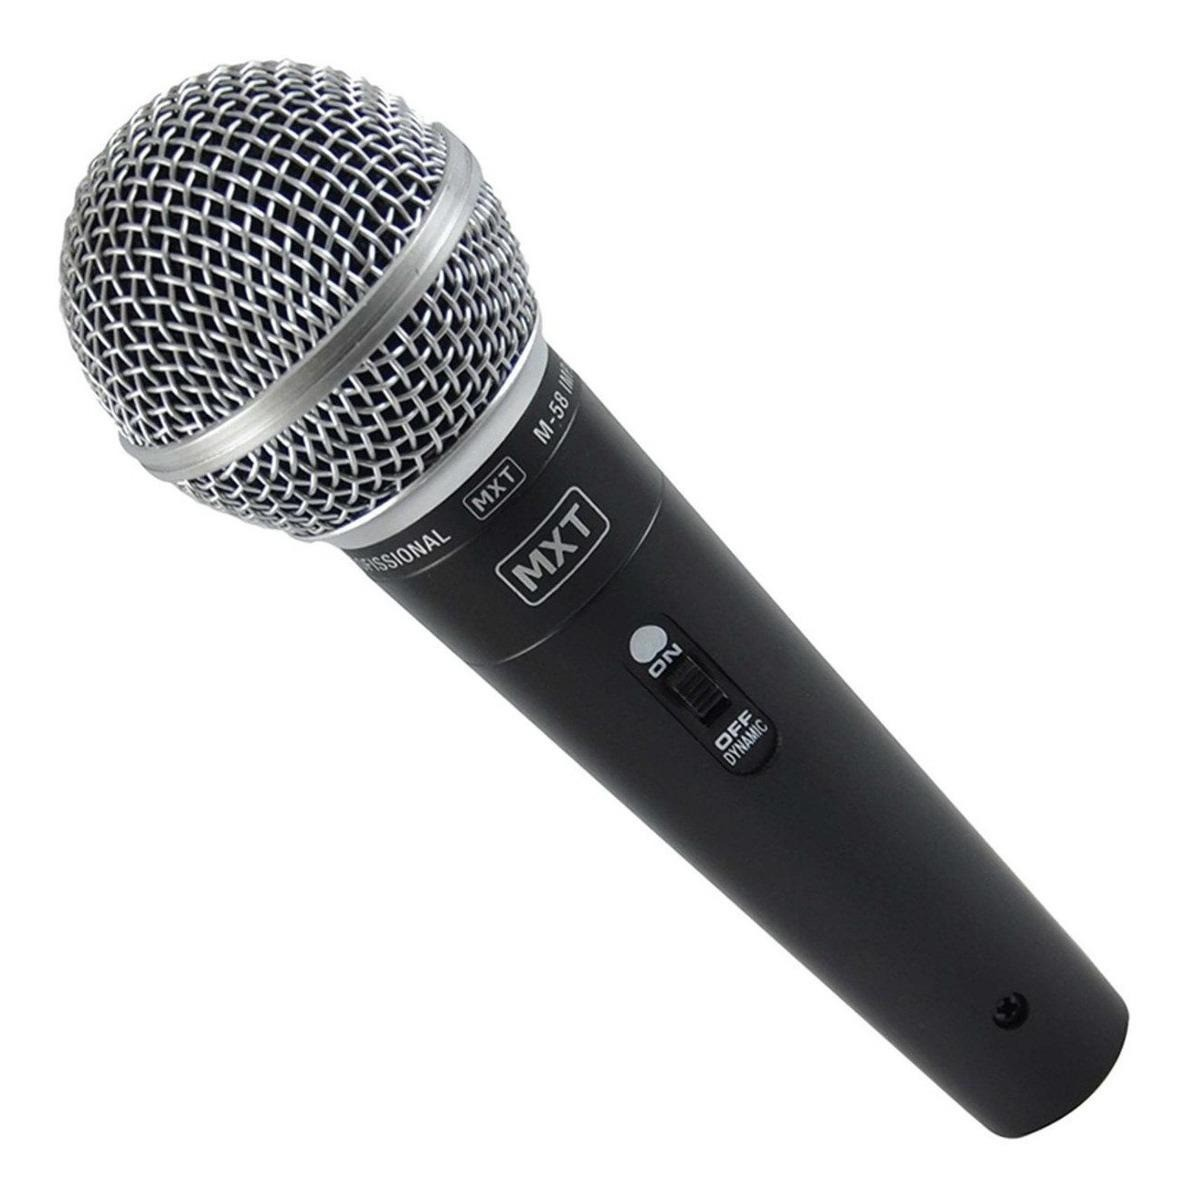 Microfone M-58 Dinâmico Cabo 3 Metros Ideal Pequenos Eventos